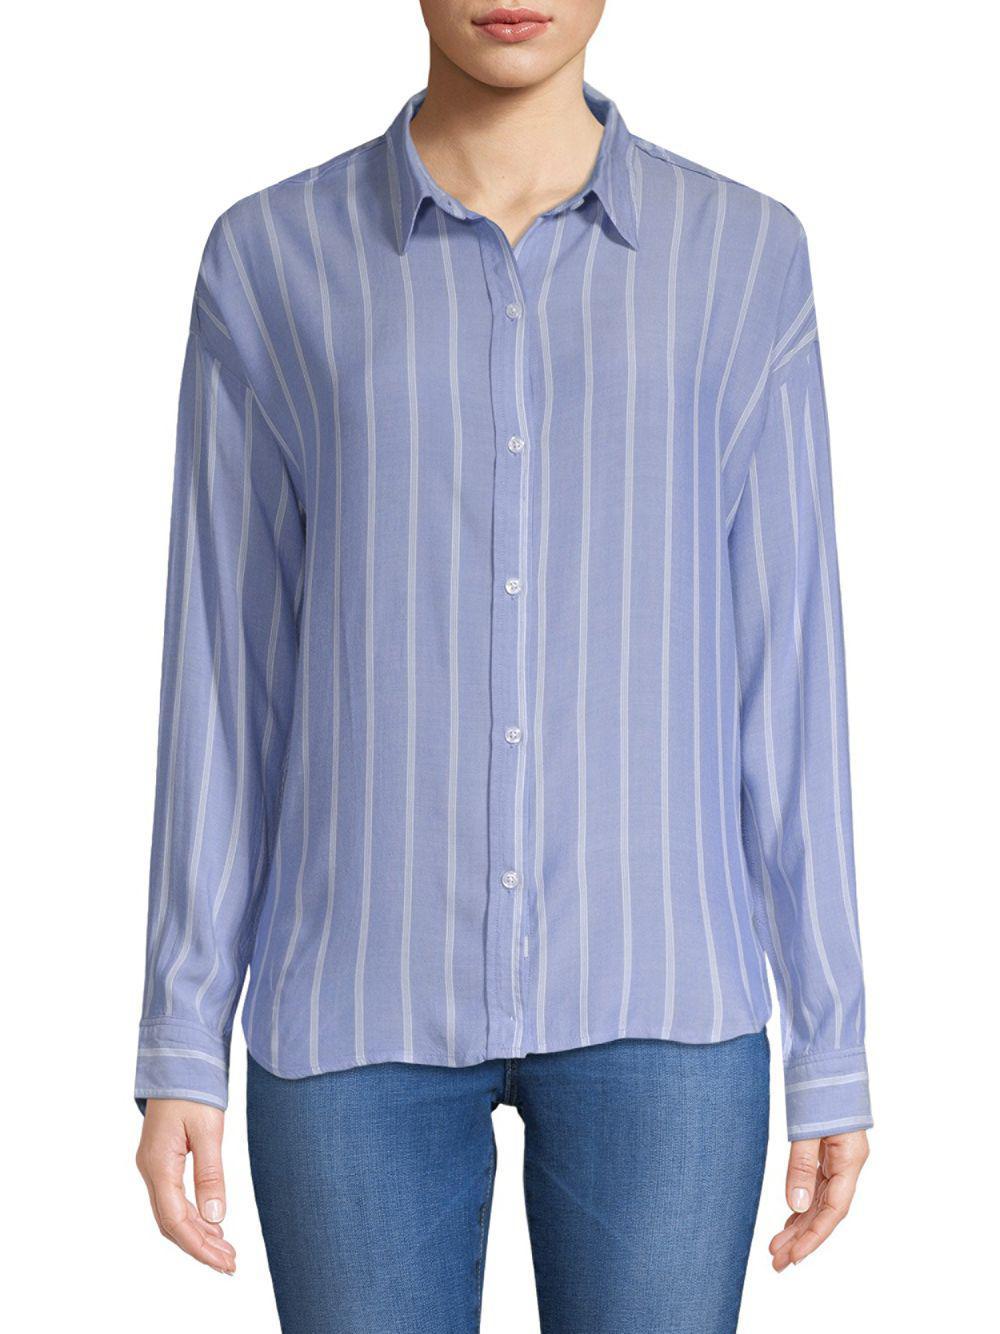 86814afce929c3 Lyst - Rails Josephine Button-down Shirt in Blue - Save 43%